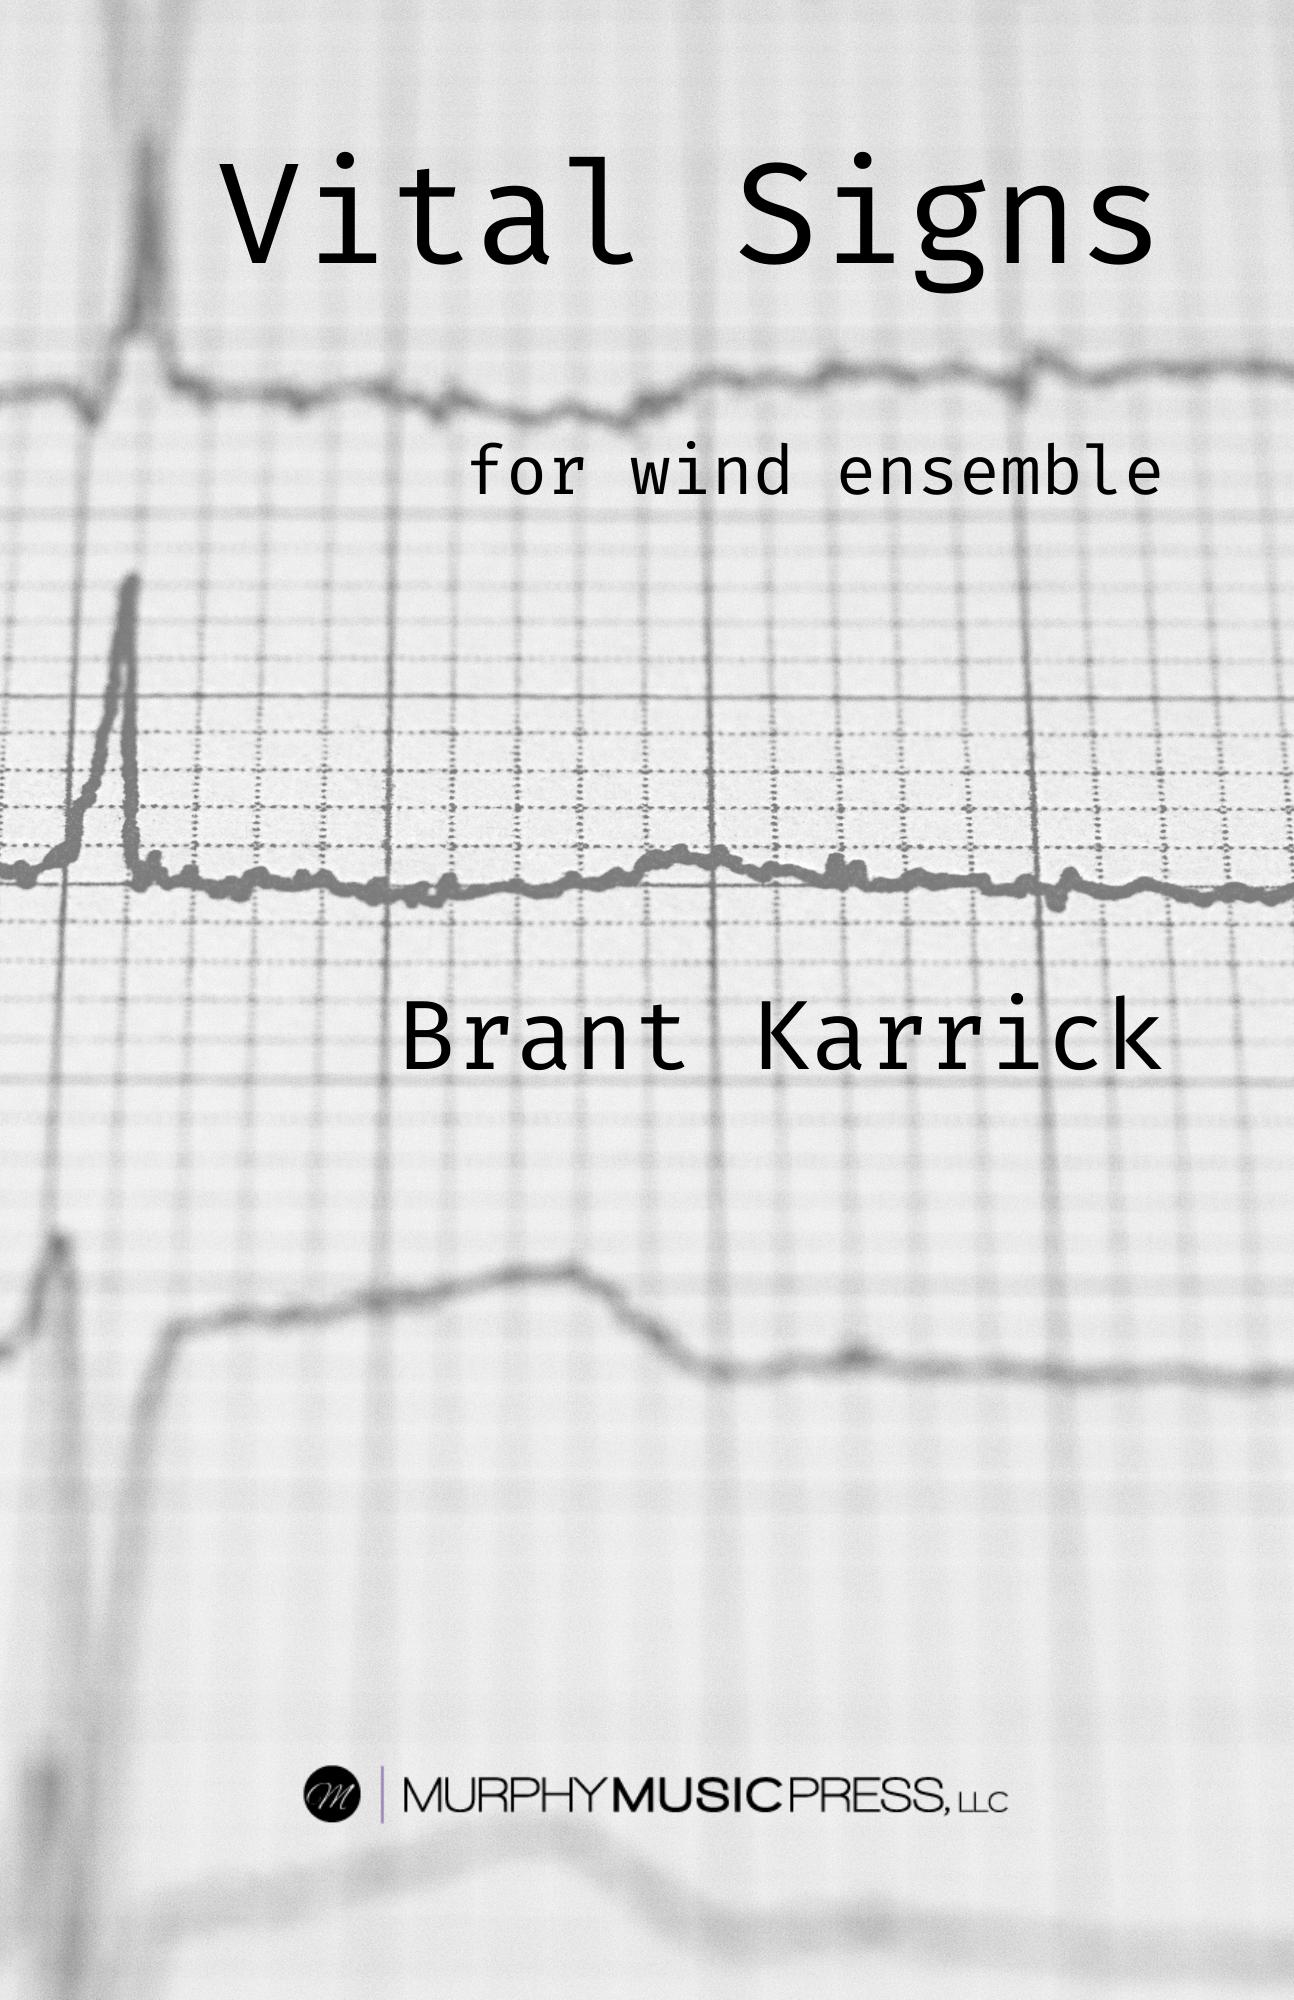 Vital Signs by Brant Karrick